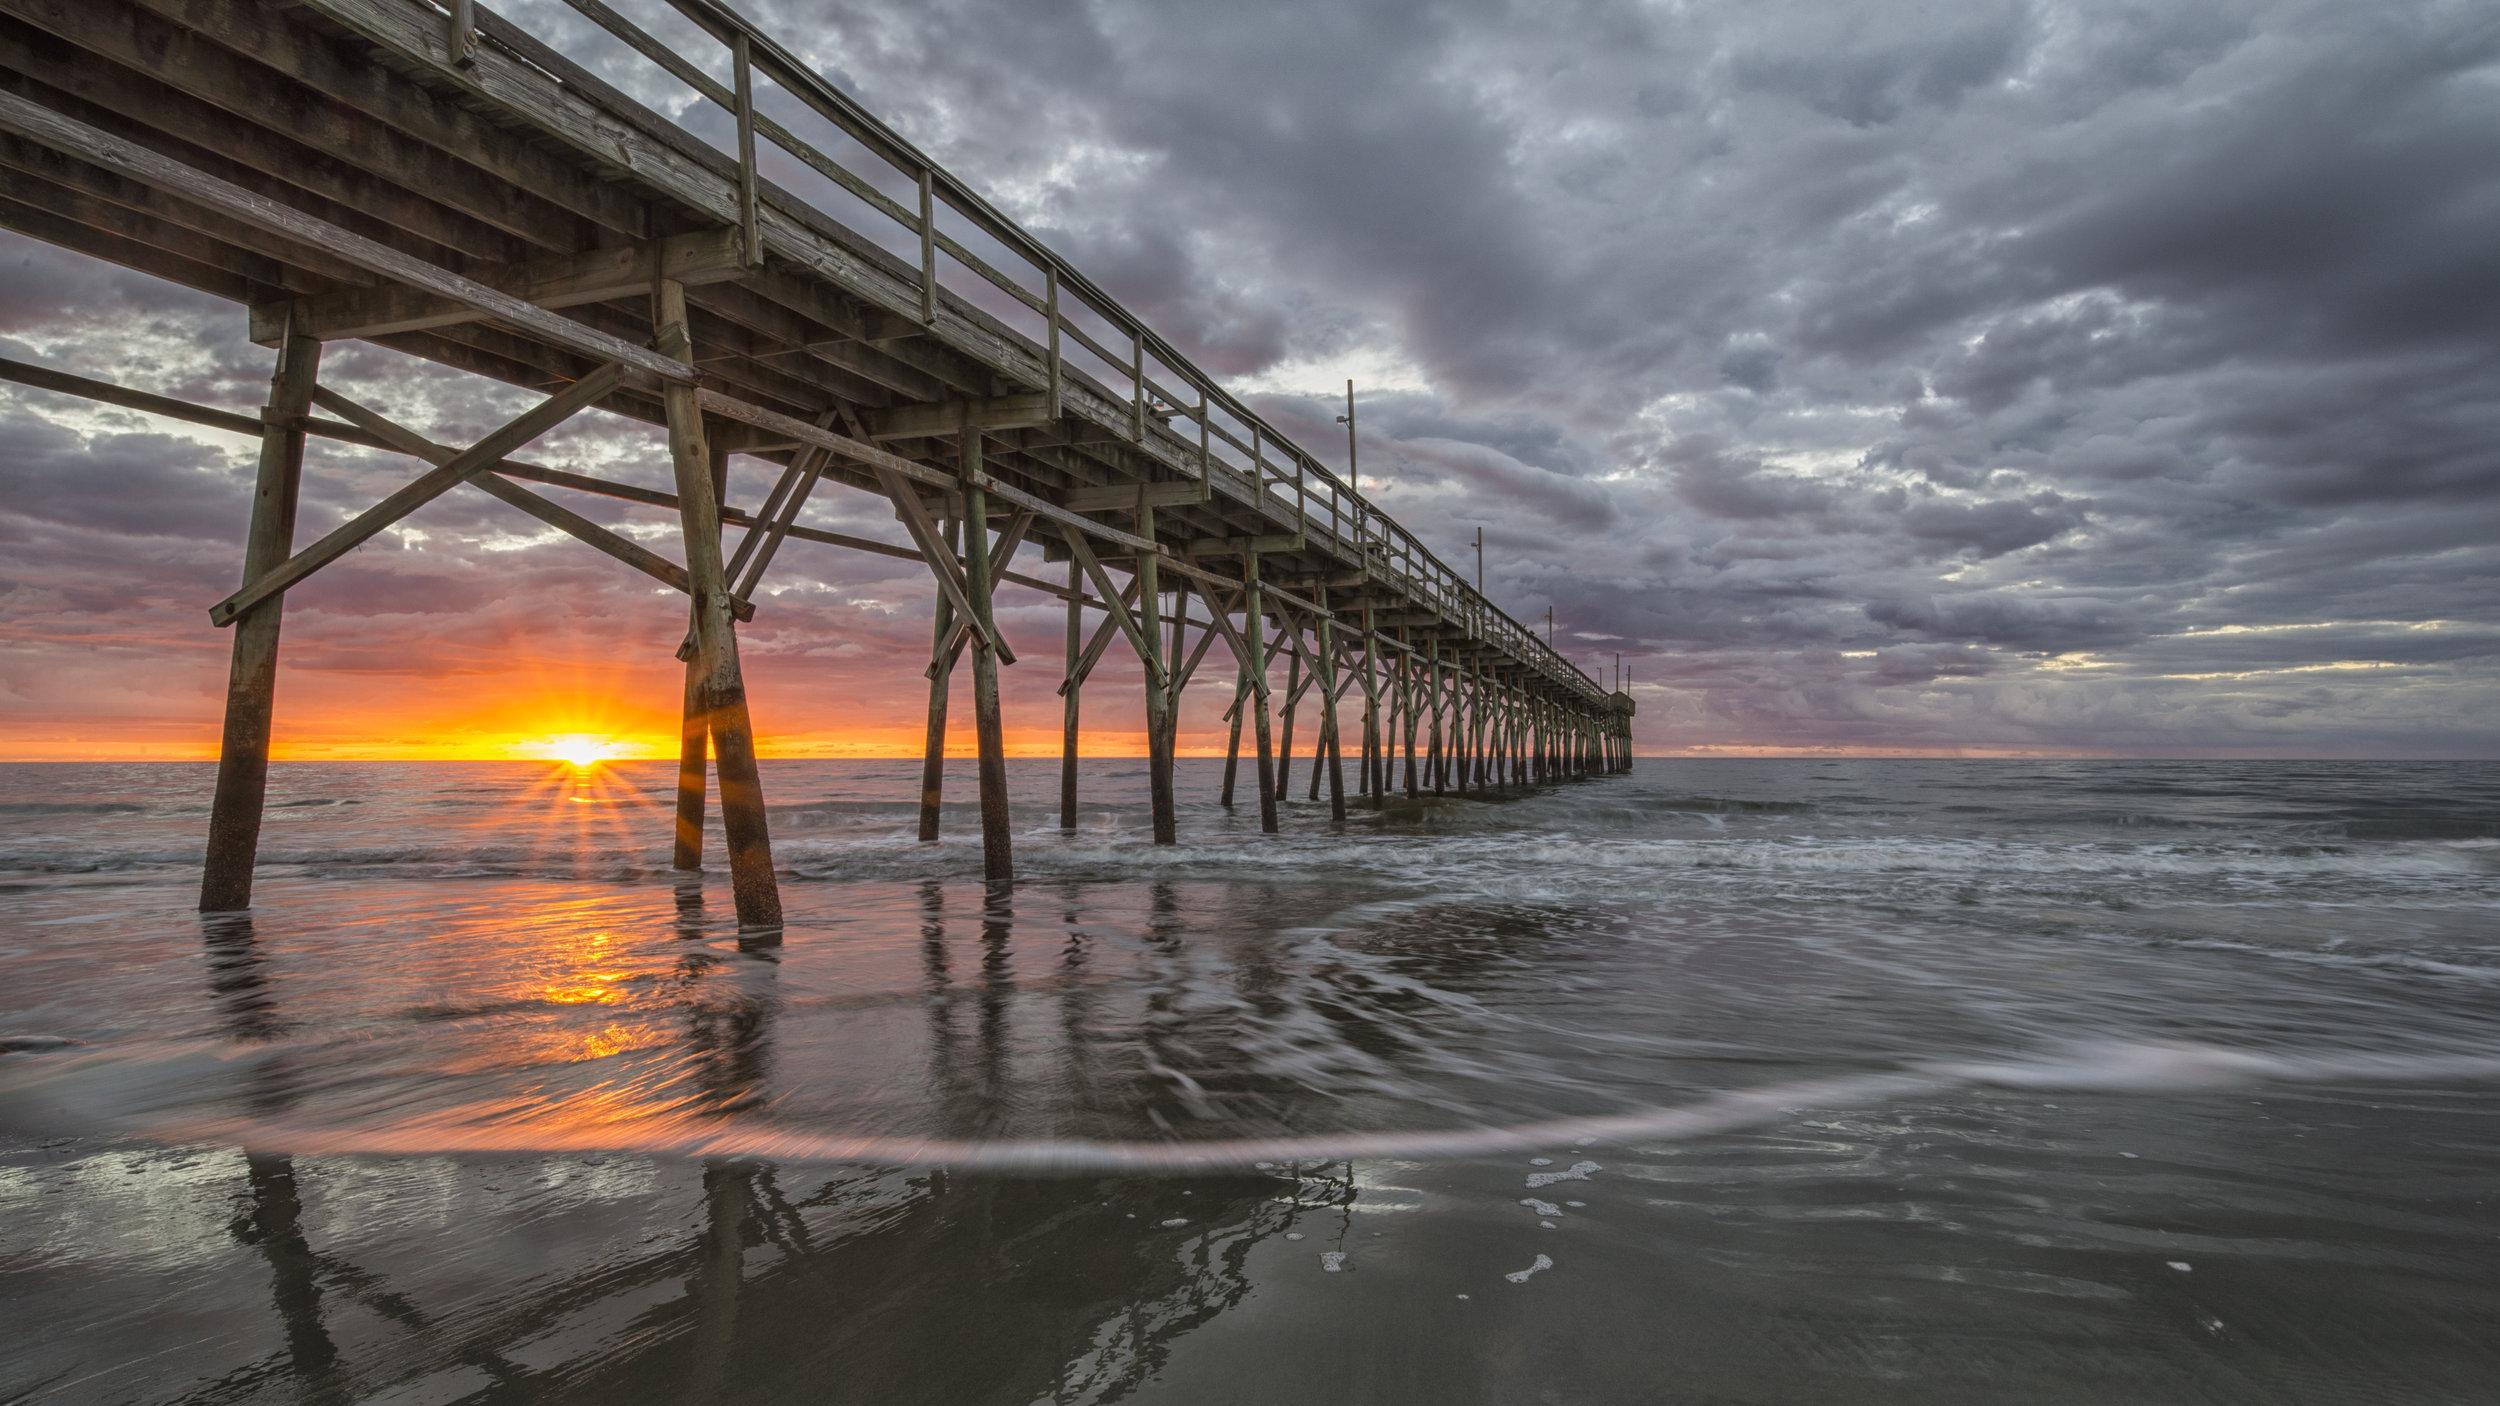 Sunrise at Sunset Beach, North Carolina